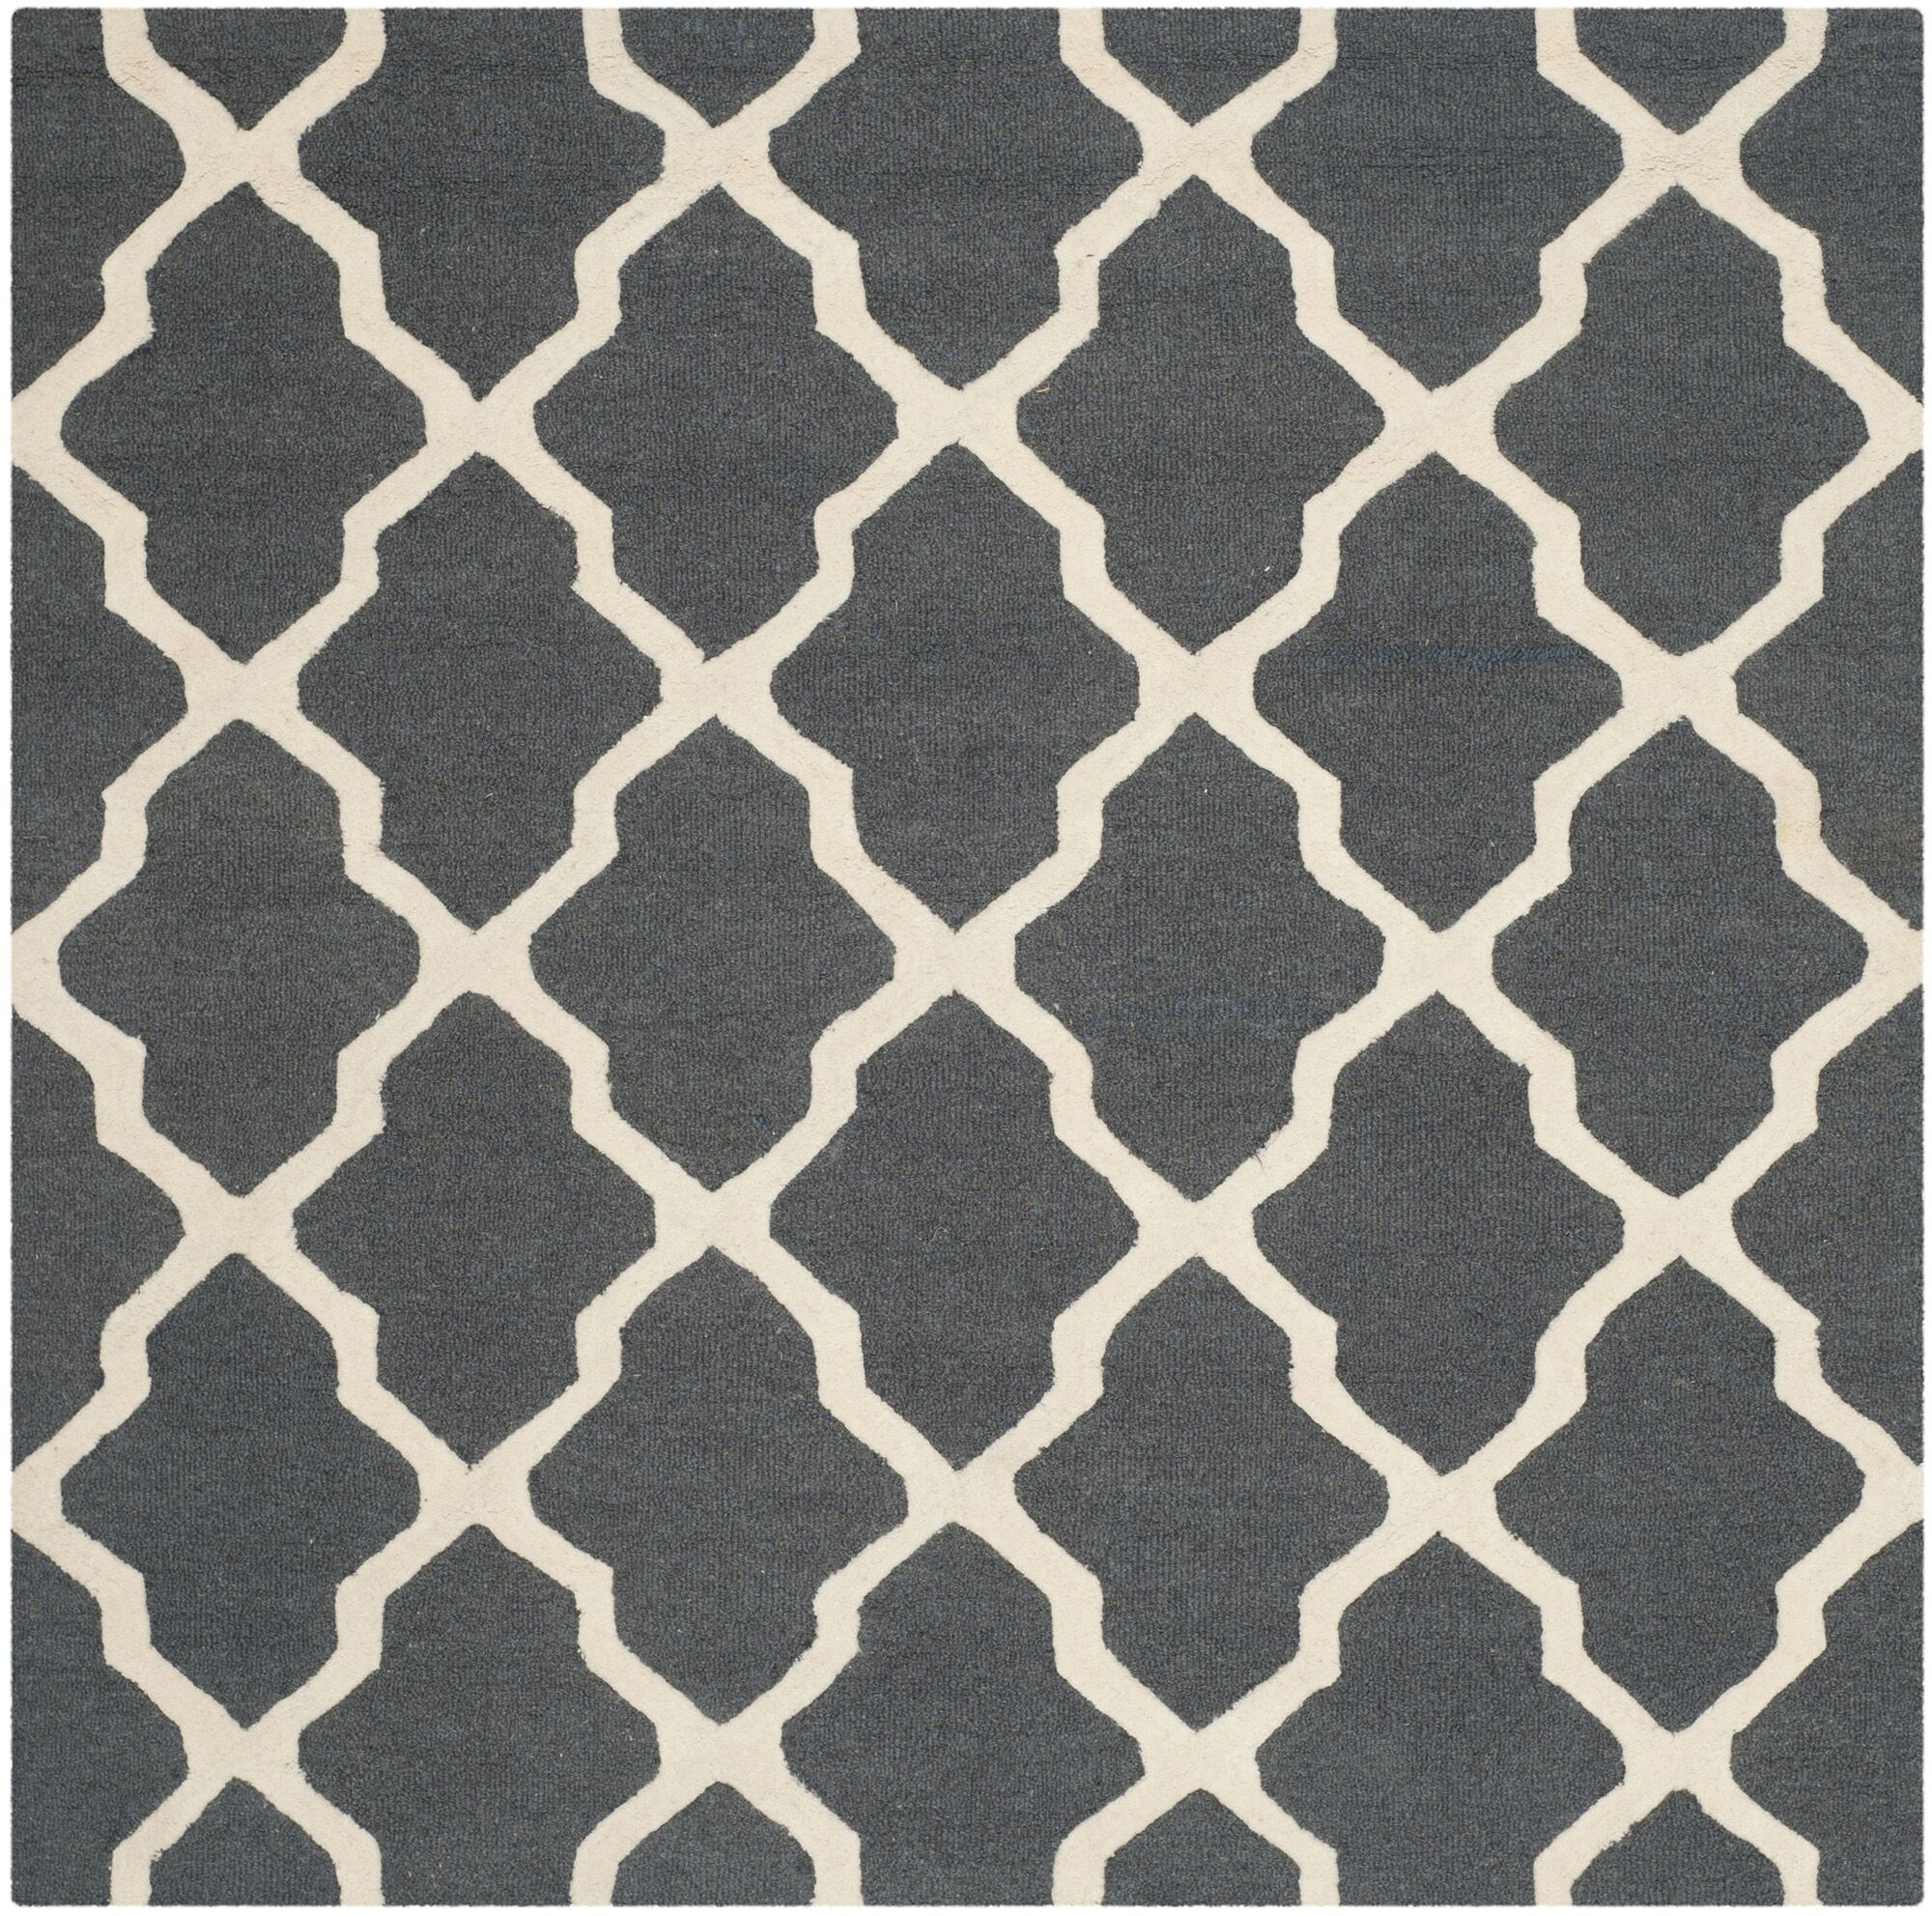 Charlenne Wool Dark Gray/Ivory Area Rug Rug Size: Square 6'